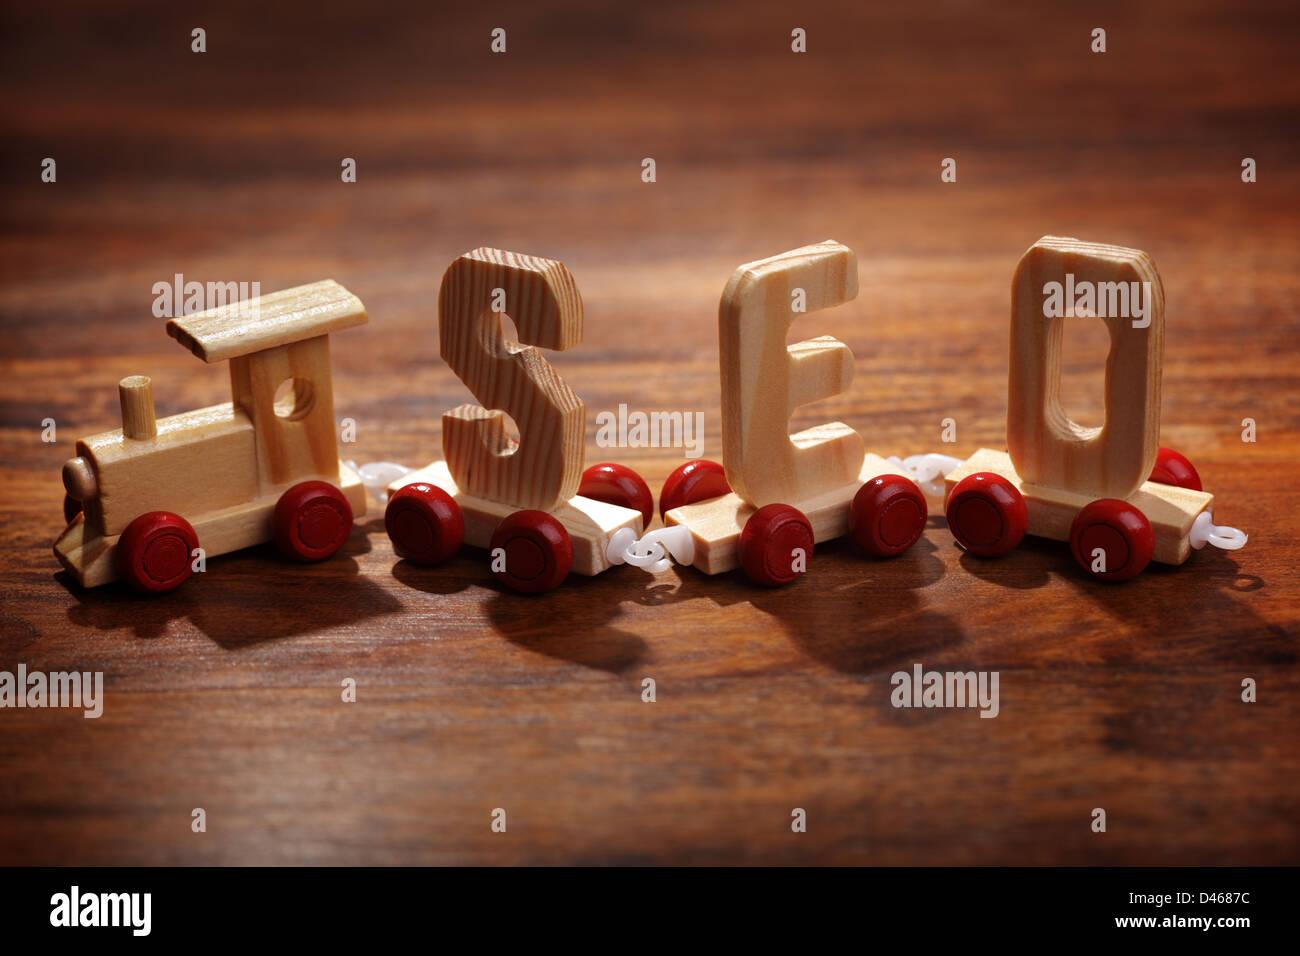 SEO - Optimización de motor de búsqueda Imagen De Stock